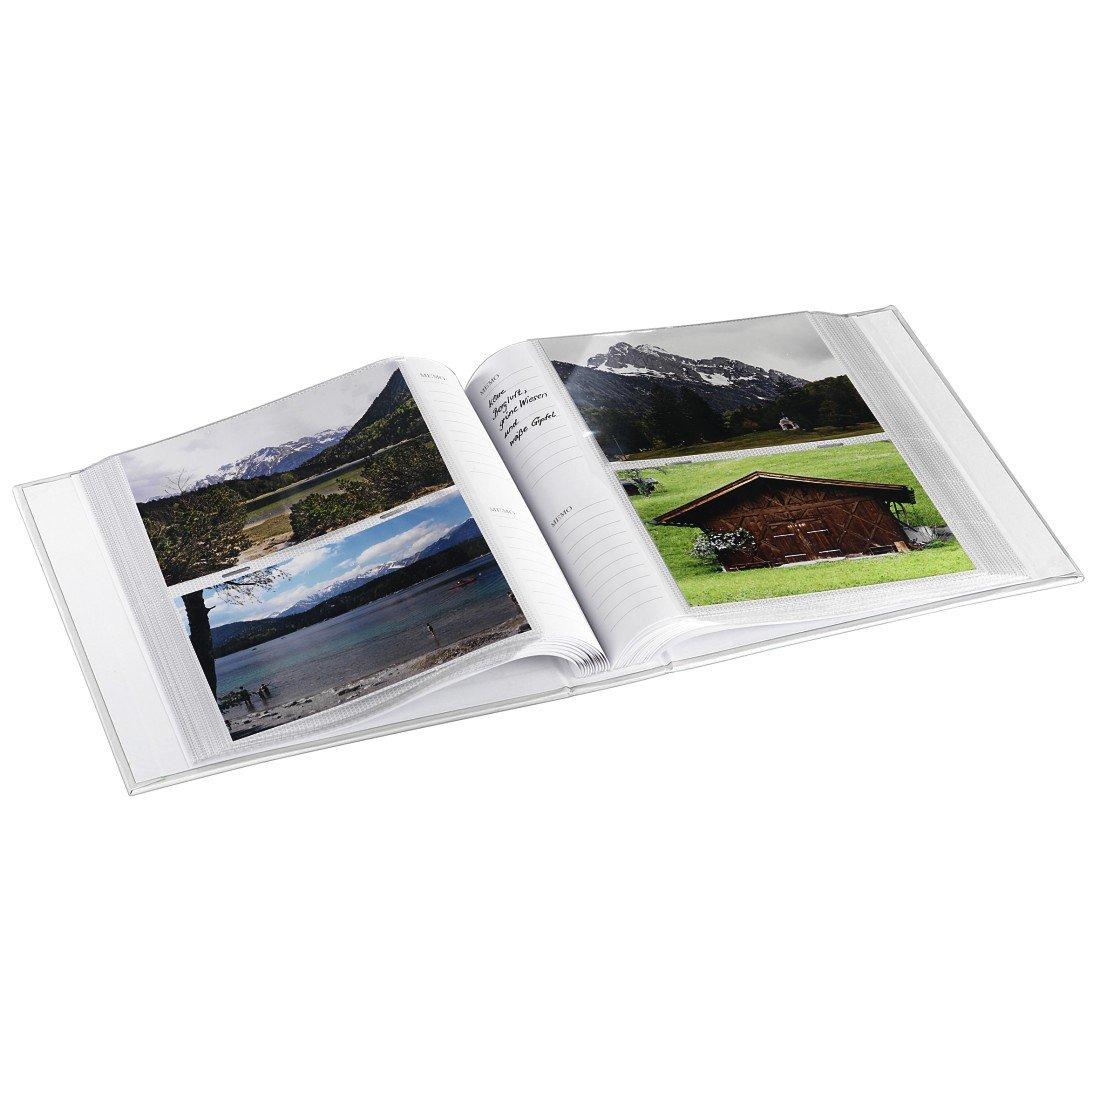 Rosso, Bianco, Grigio Hama Rustico Photo albums